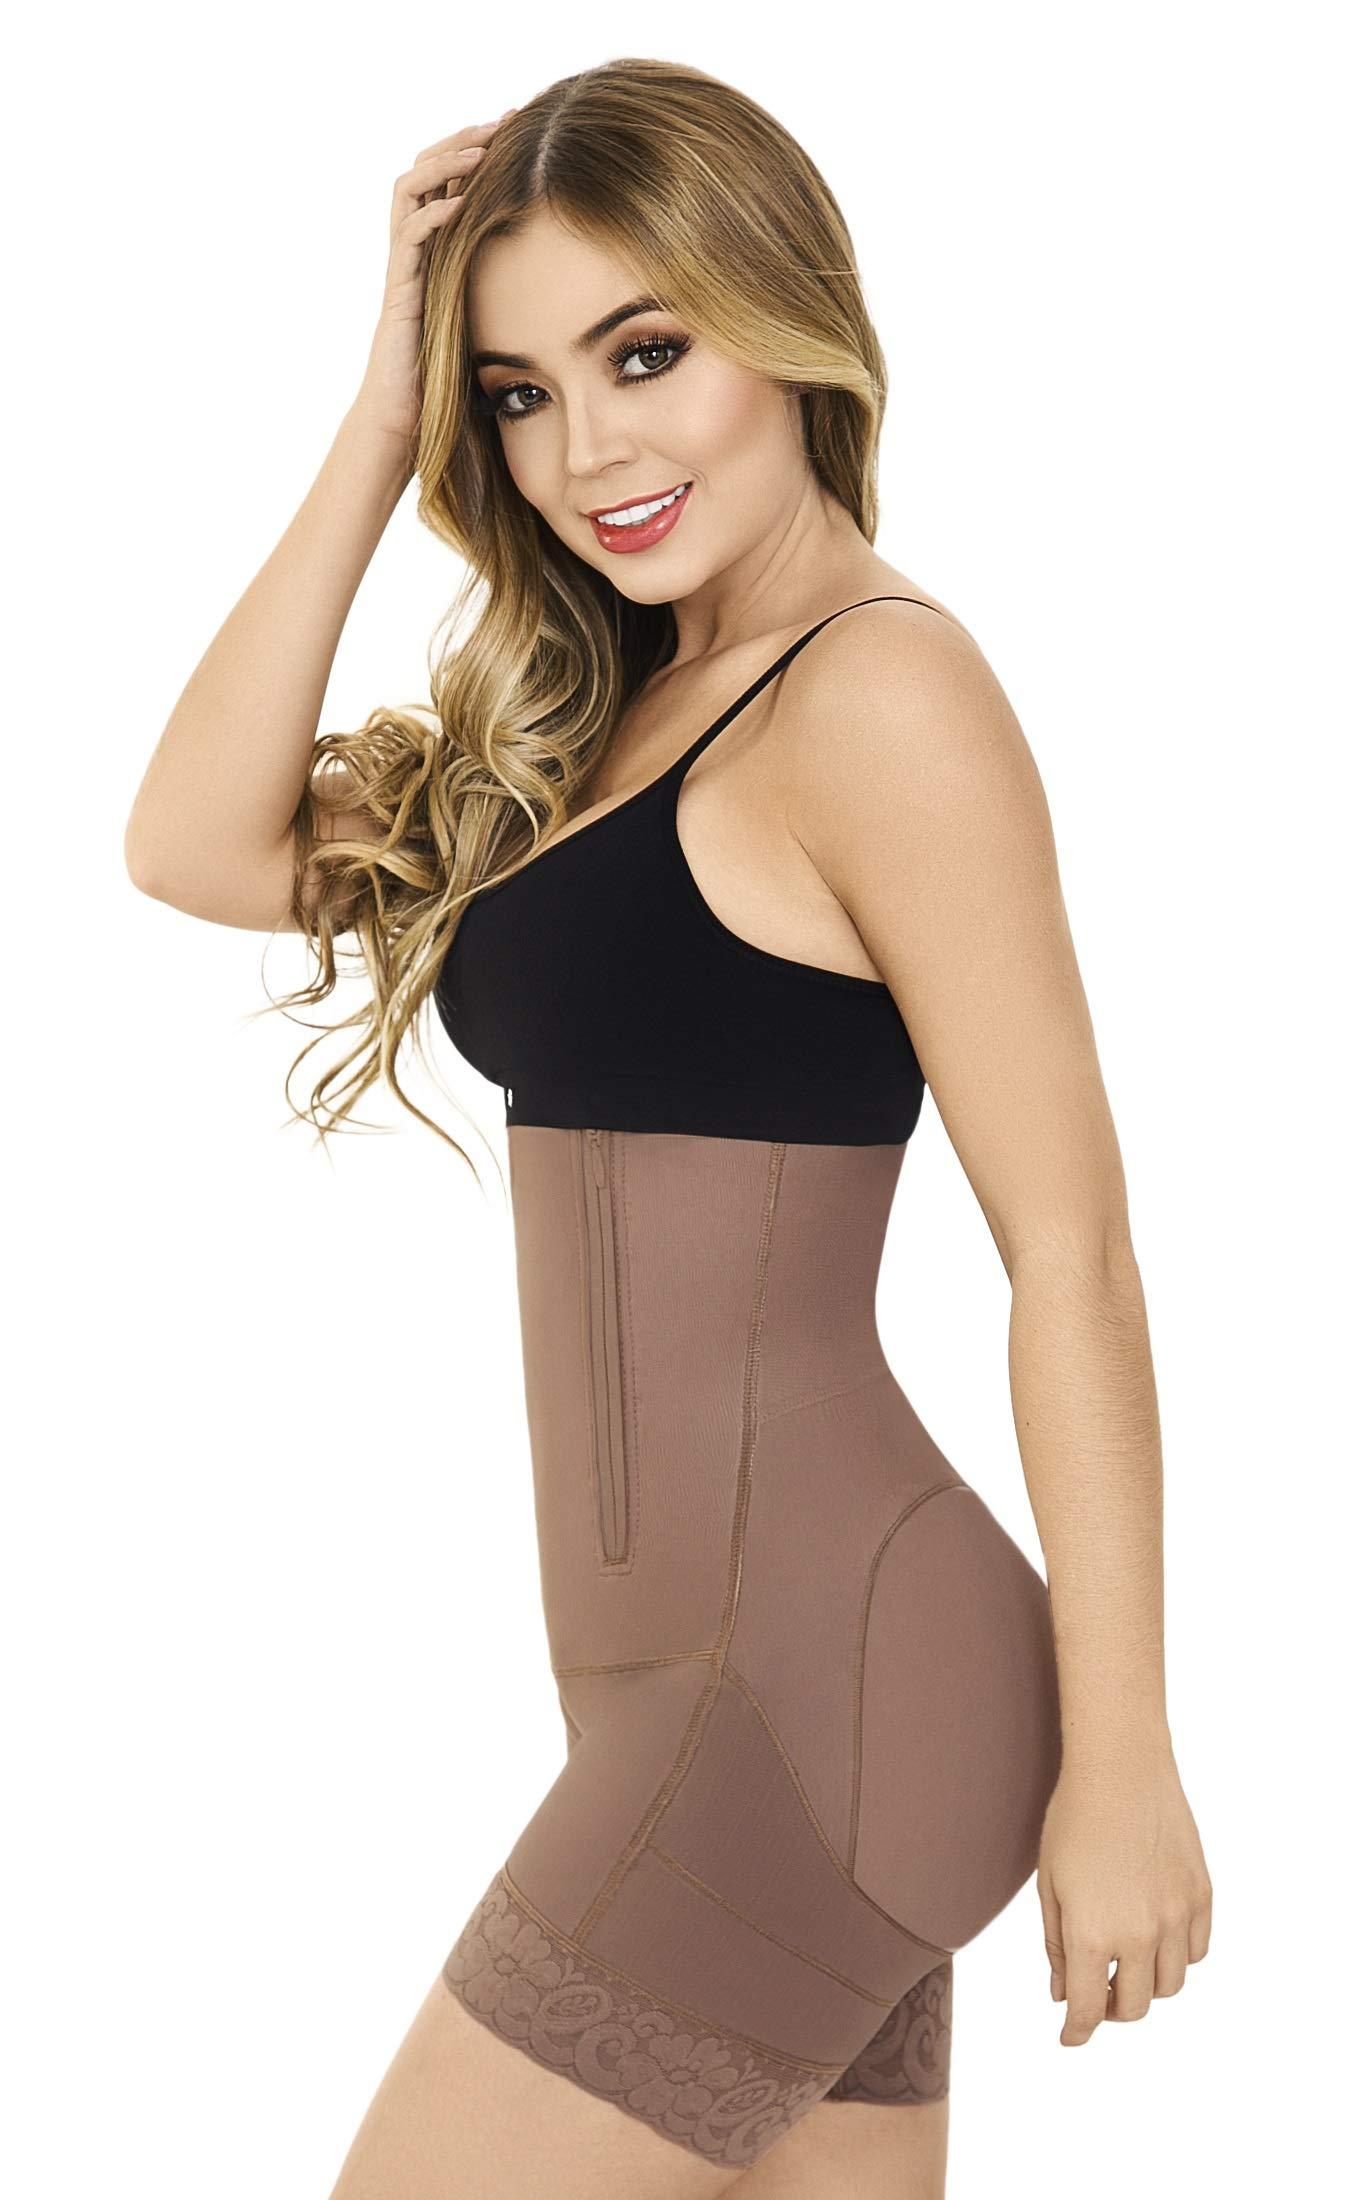 236830f3d4a9b Fajas Moldeadora Colombianas Bodysuit Levanta Cola Buttock Lift Body Shaper  Powernet Postpartum Girdle Shapewear Cocoa M